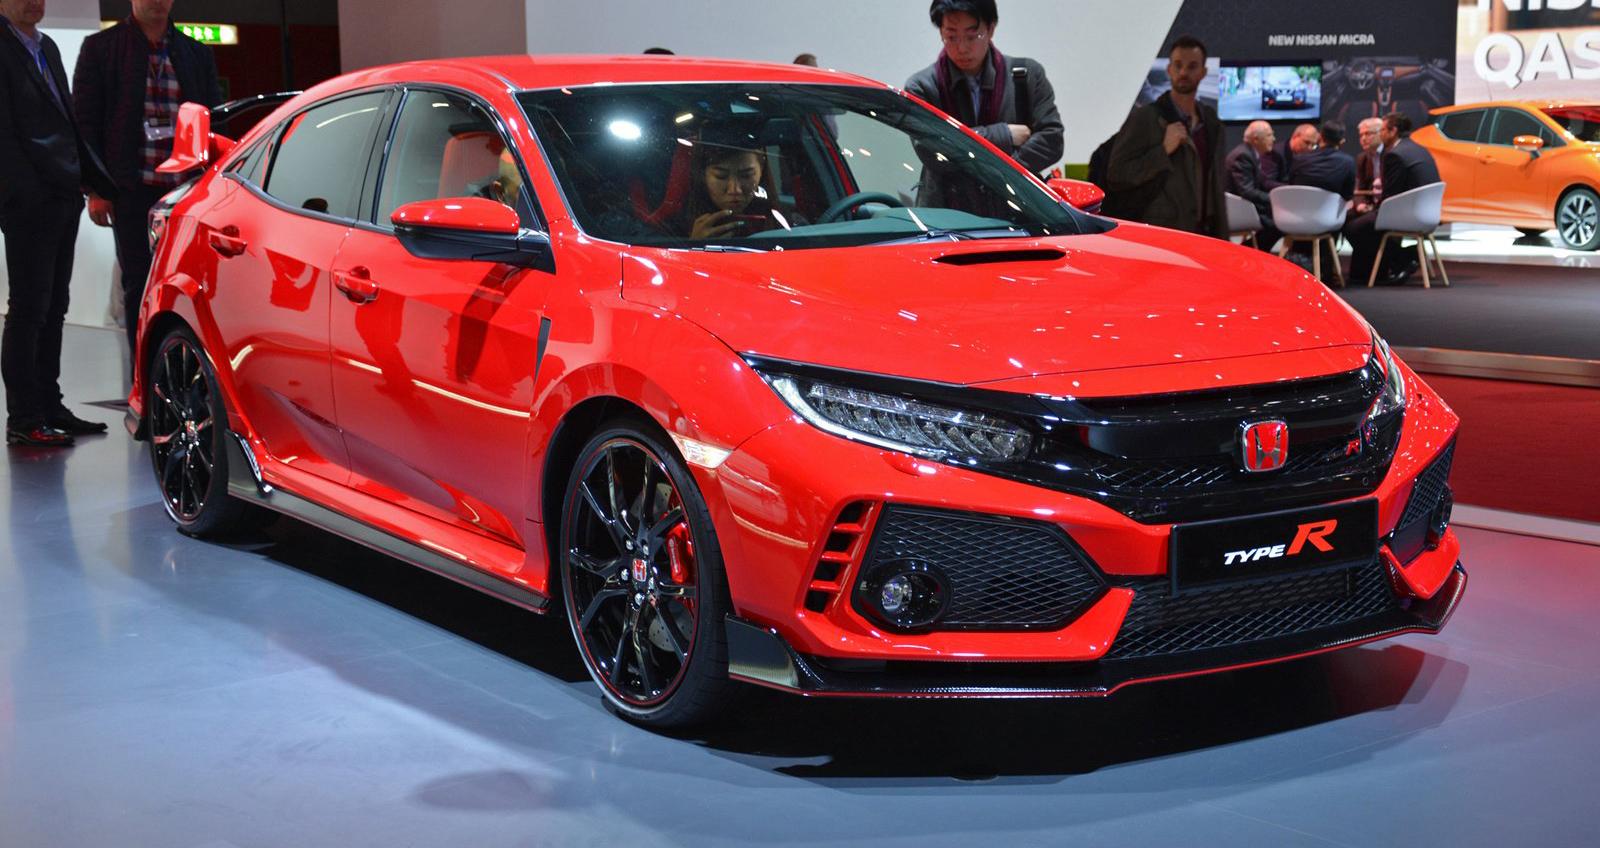 Honda civic type r 2018 v a ra m t for 2018 civic type r motor